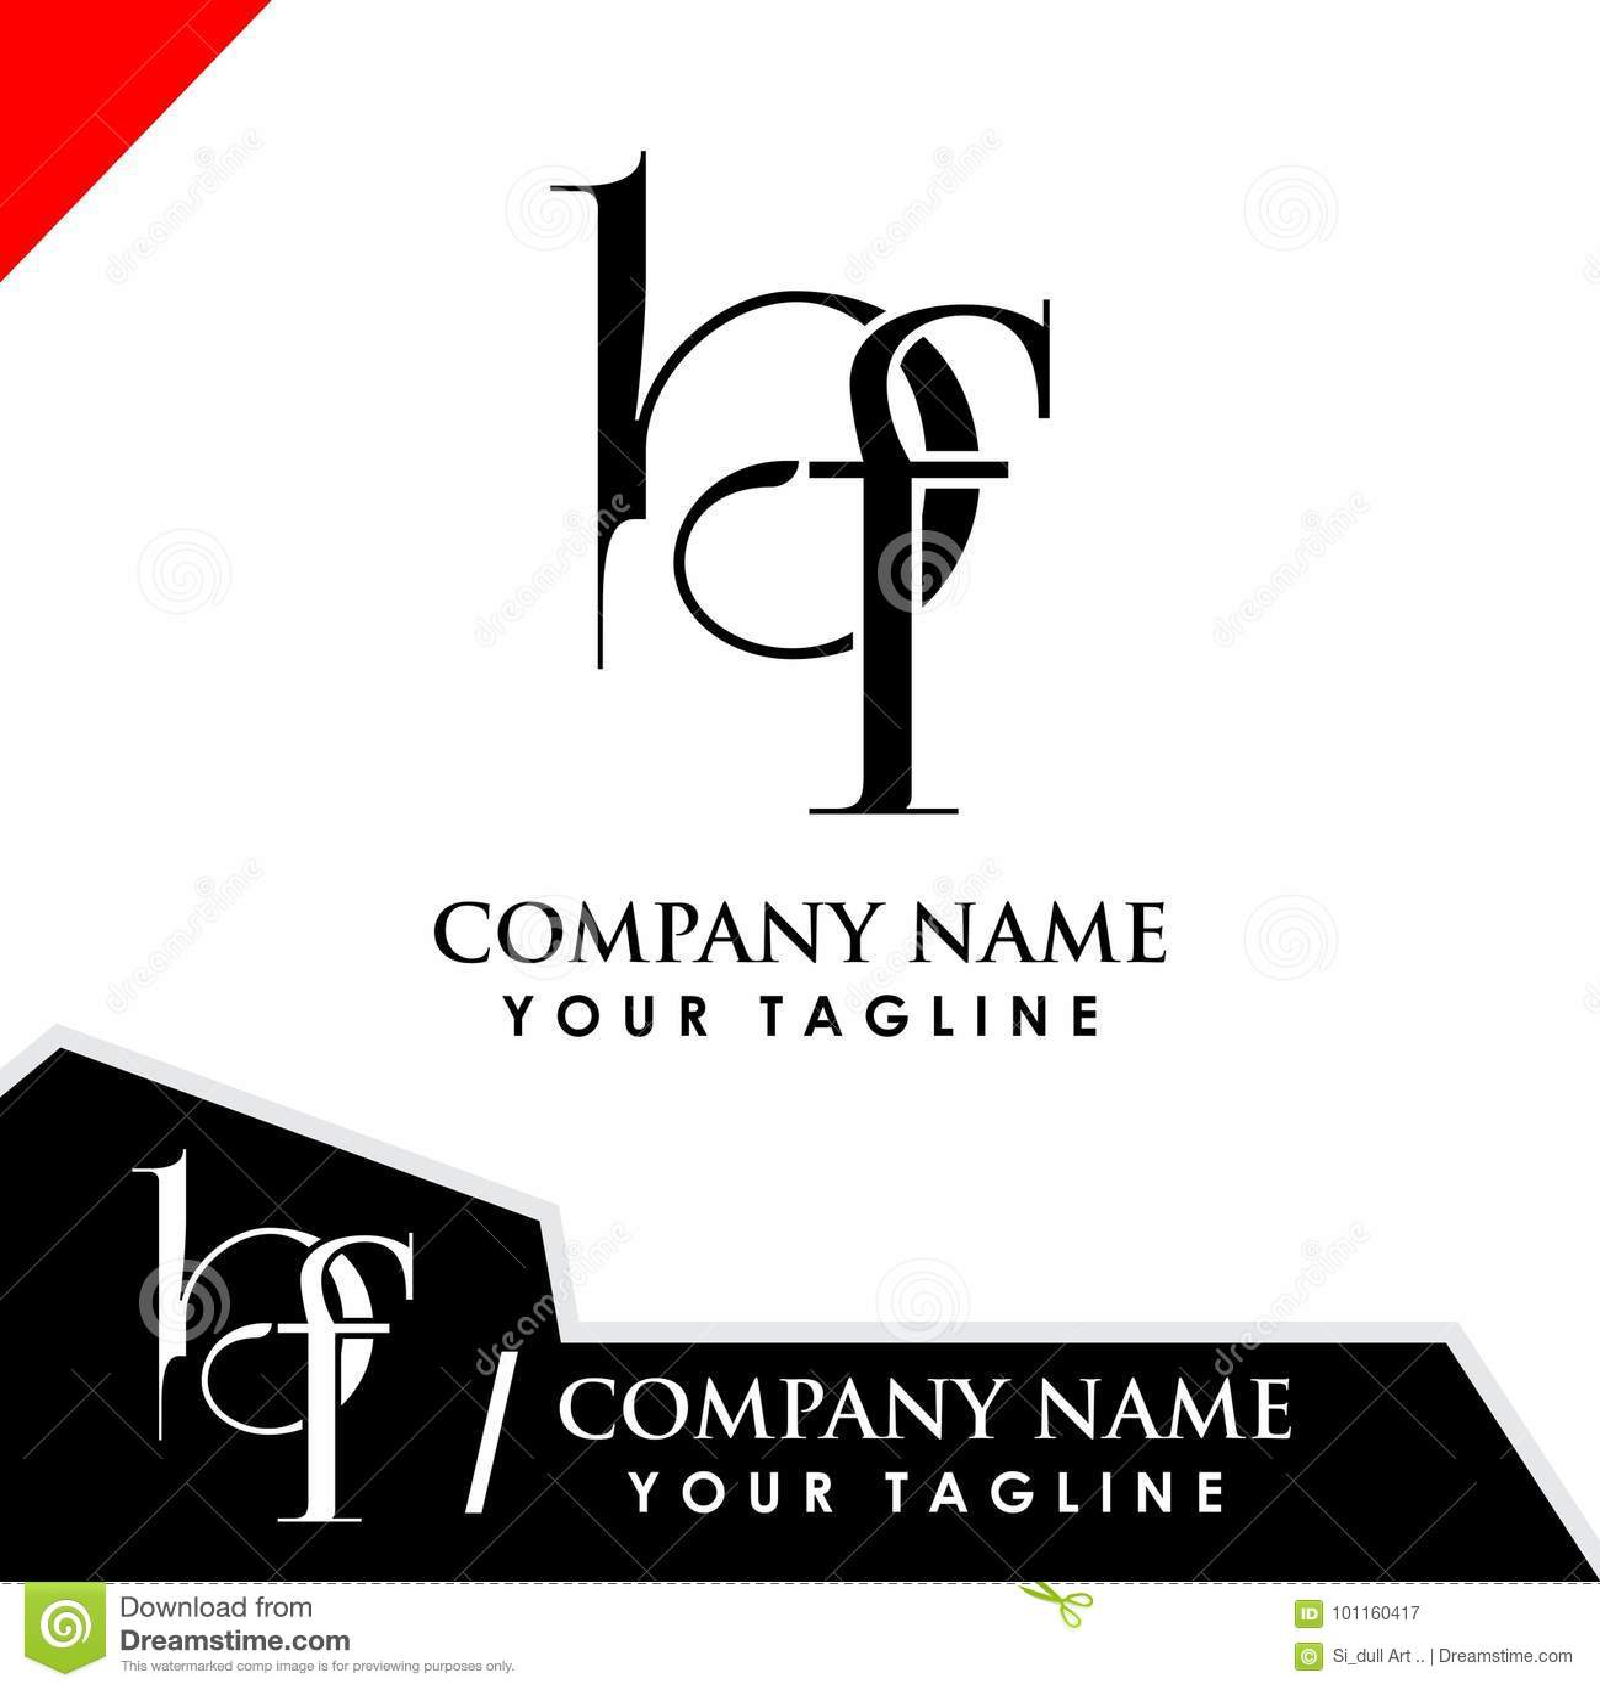 Initial Logo Design Bf Stock Vector. Illustration Of